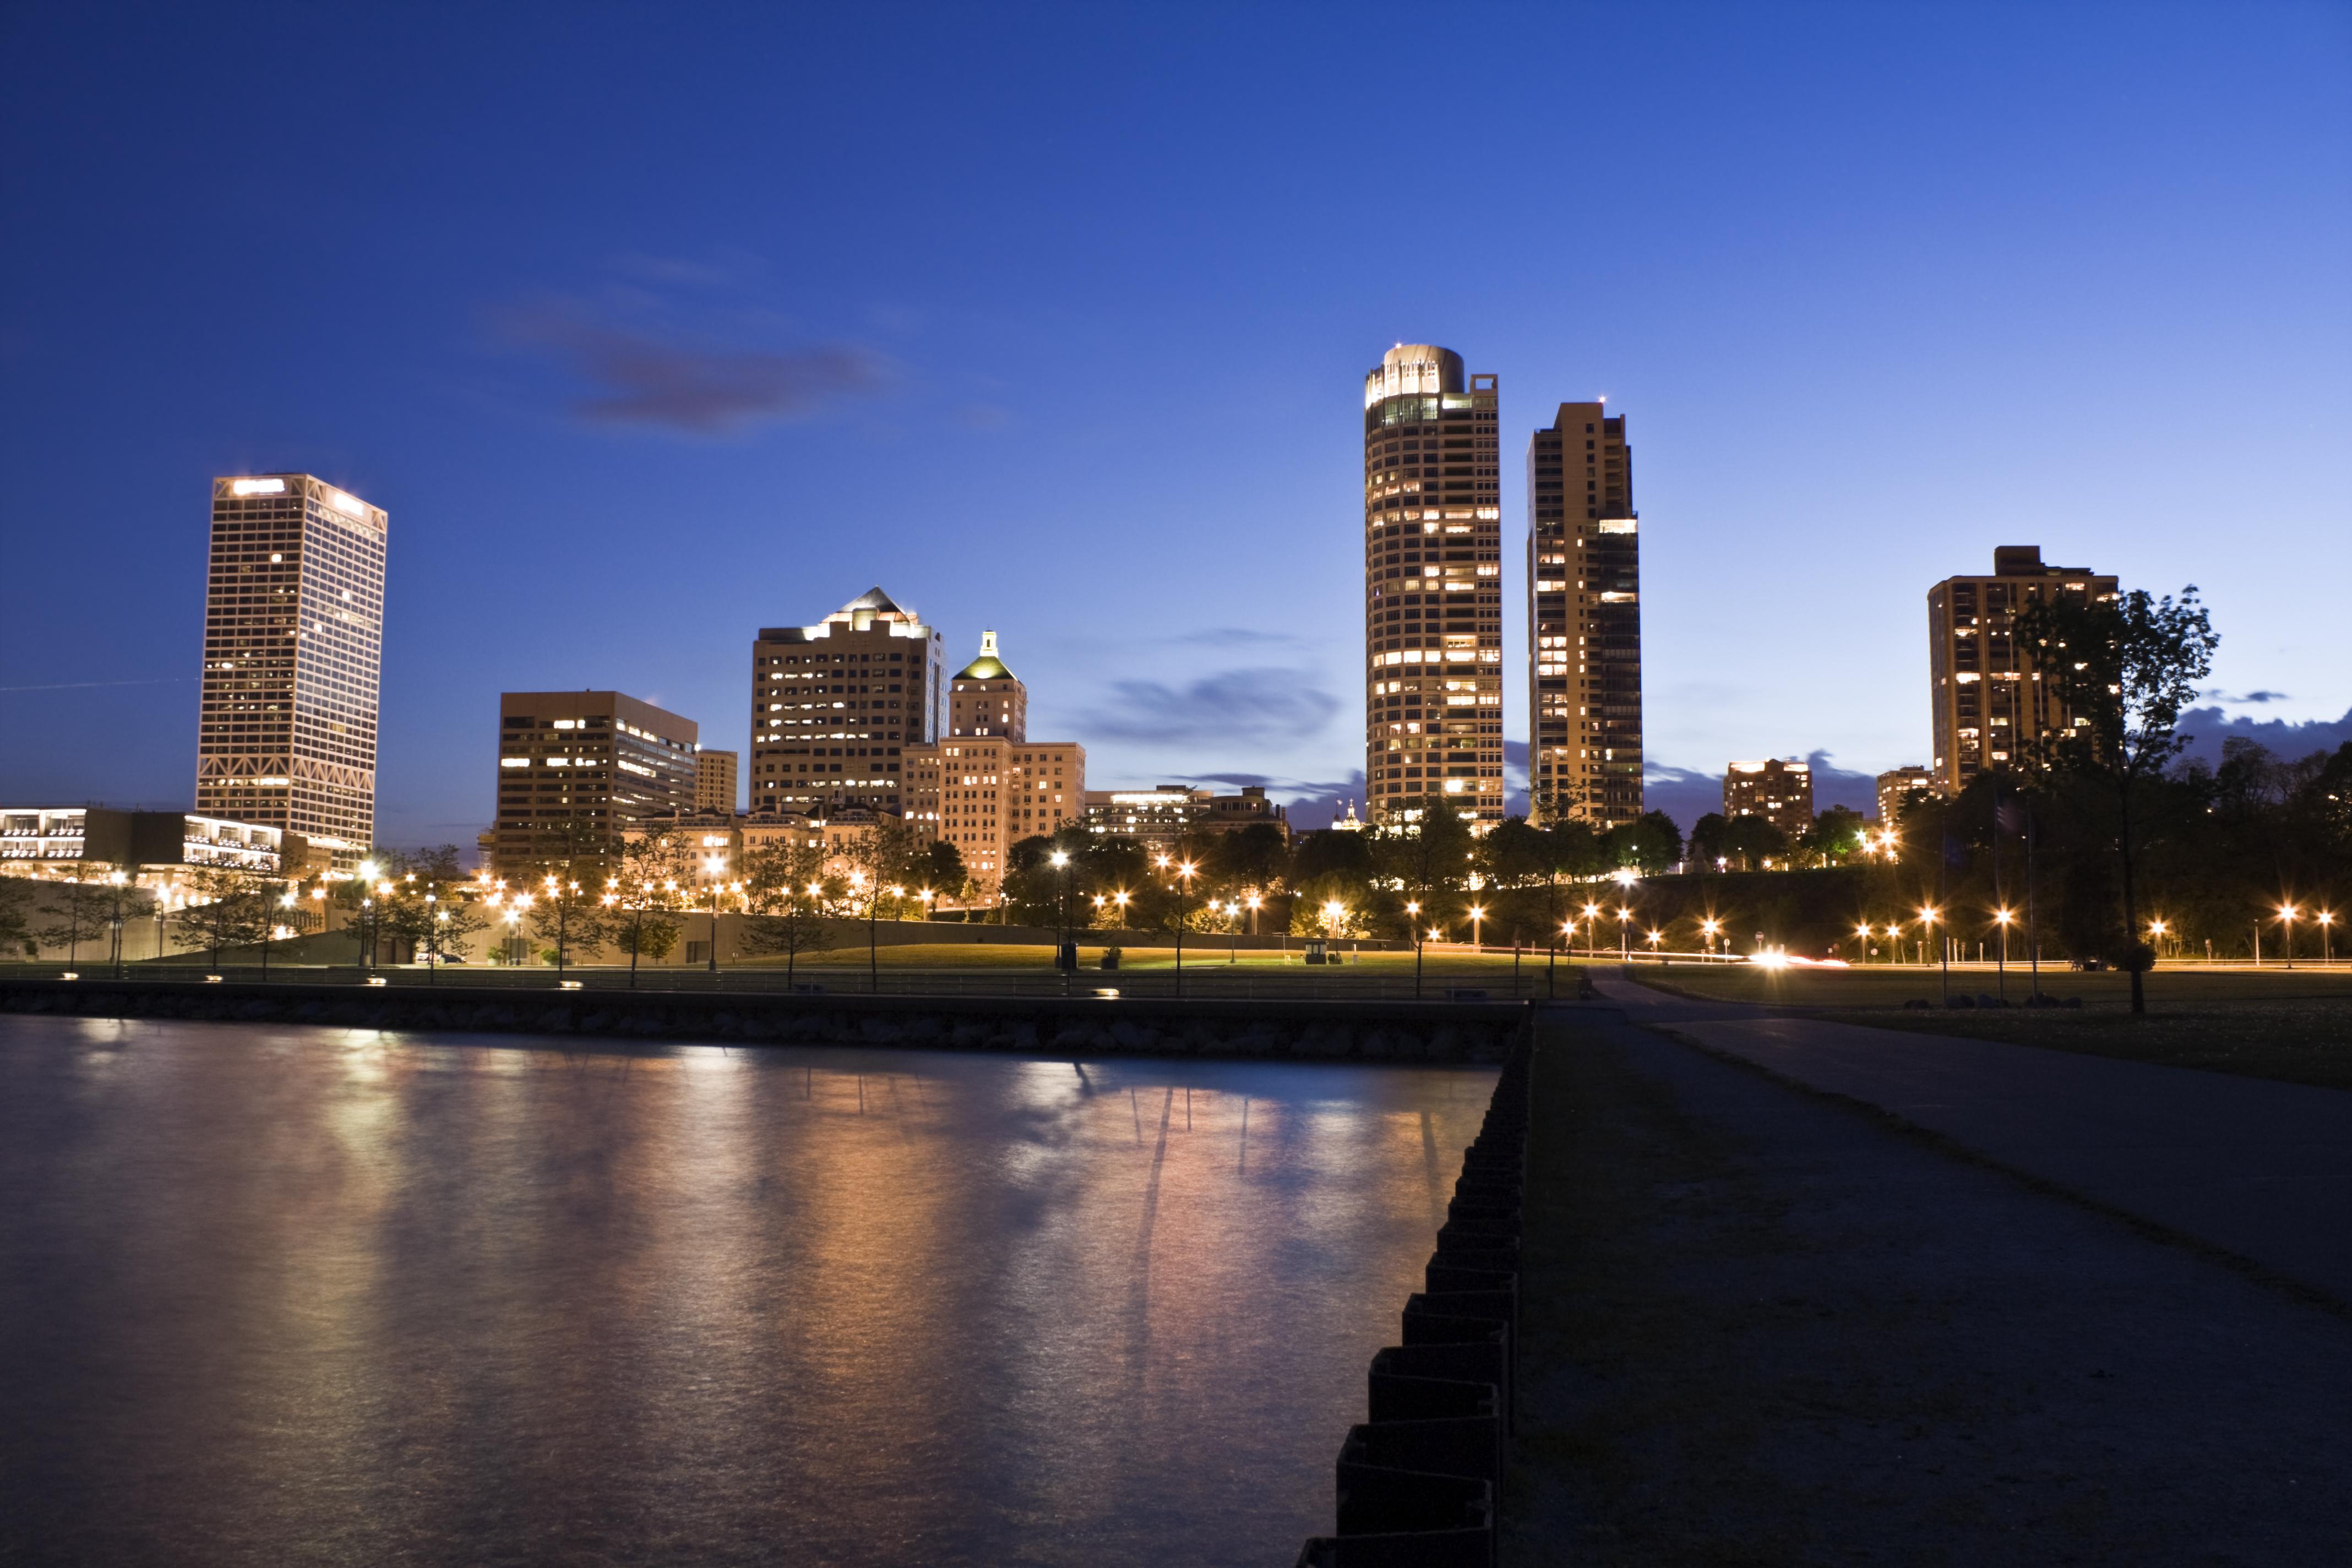 Wisconsin's biggest city, Milwaukee, at night